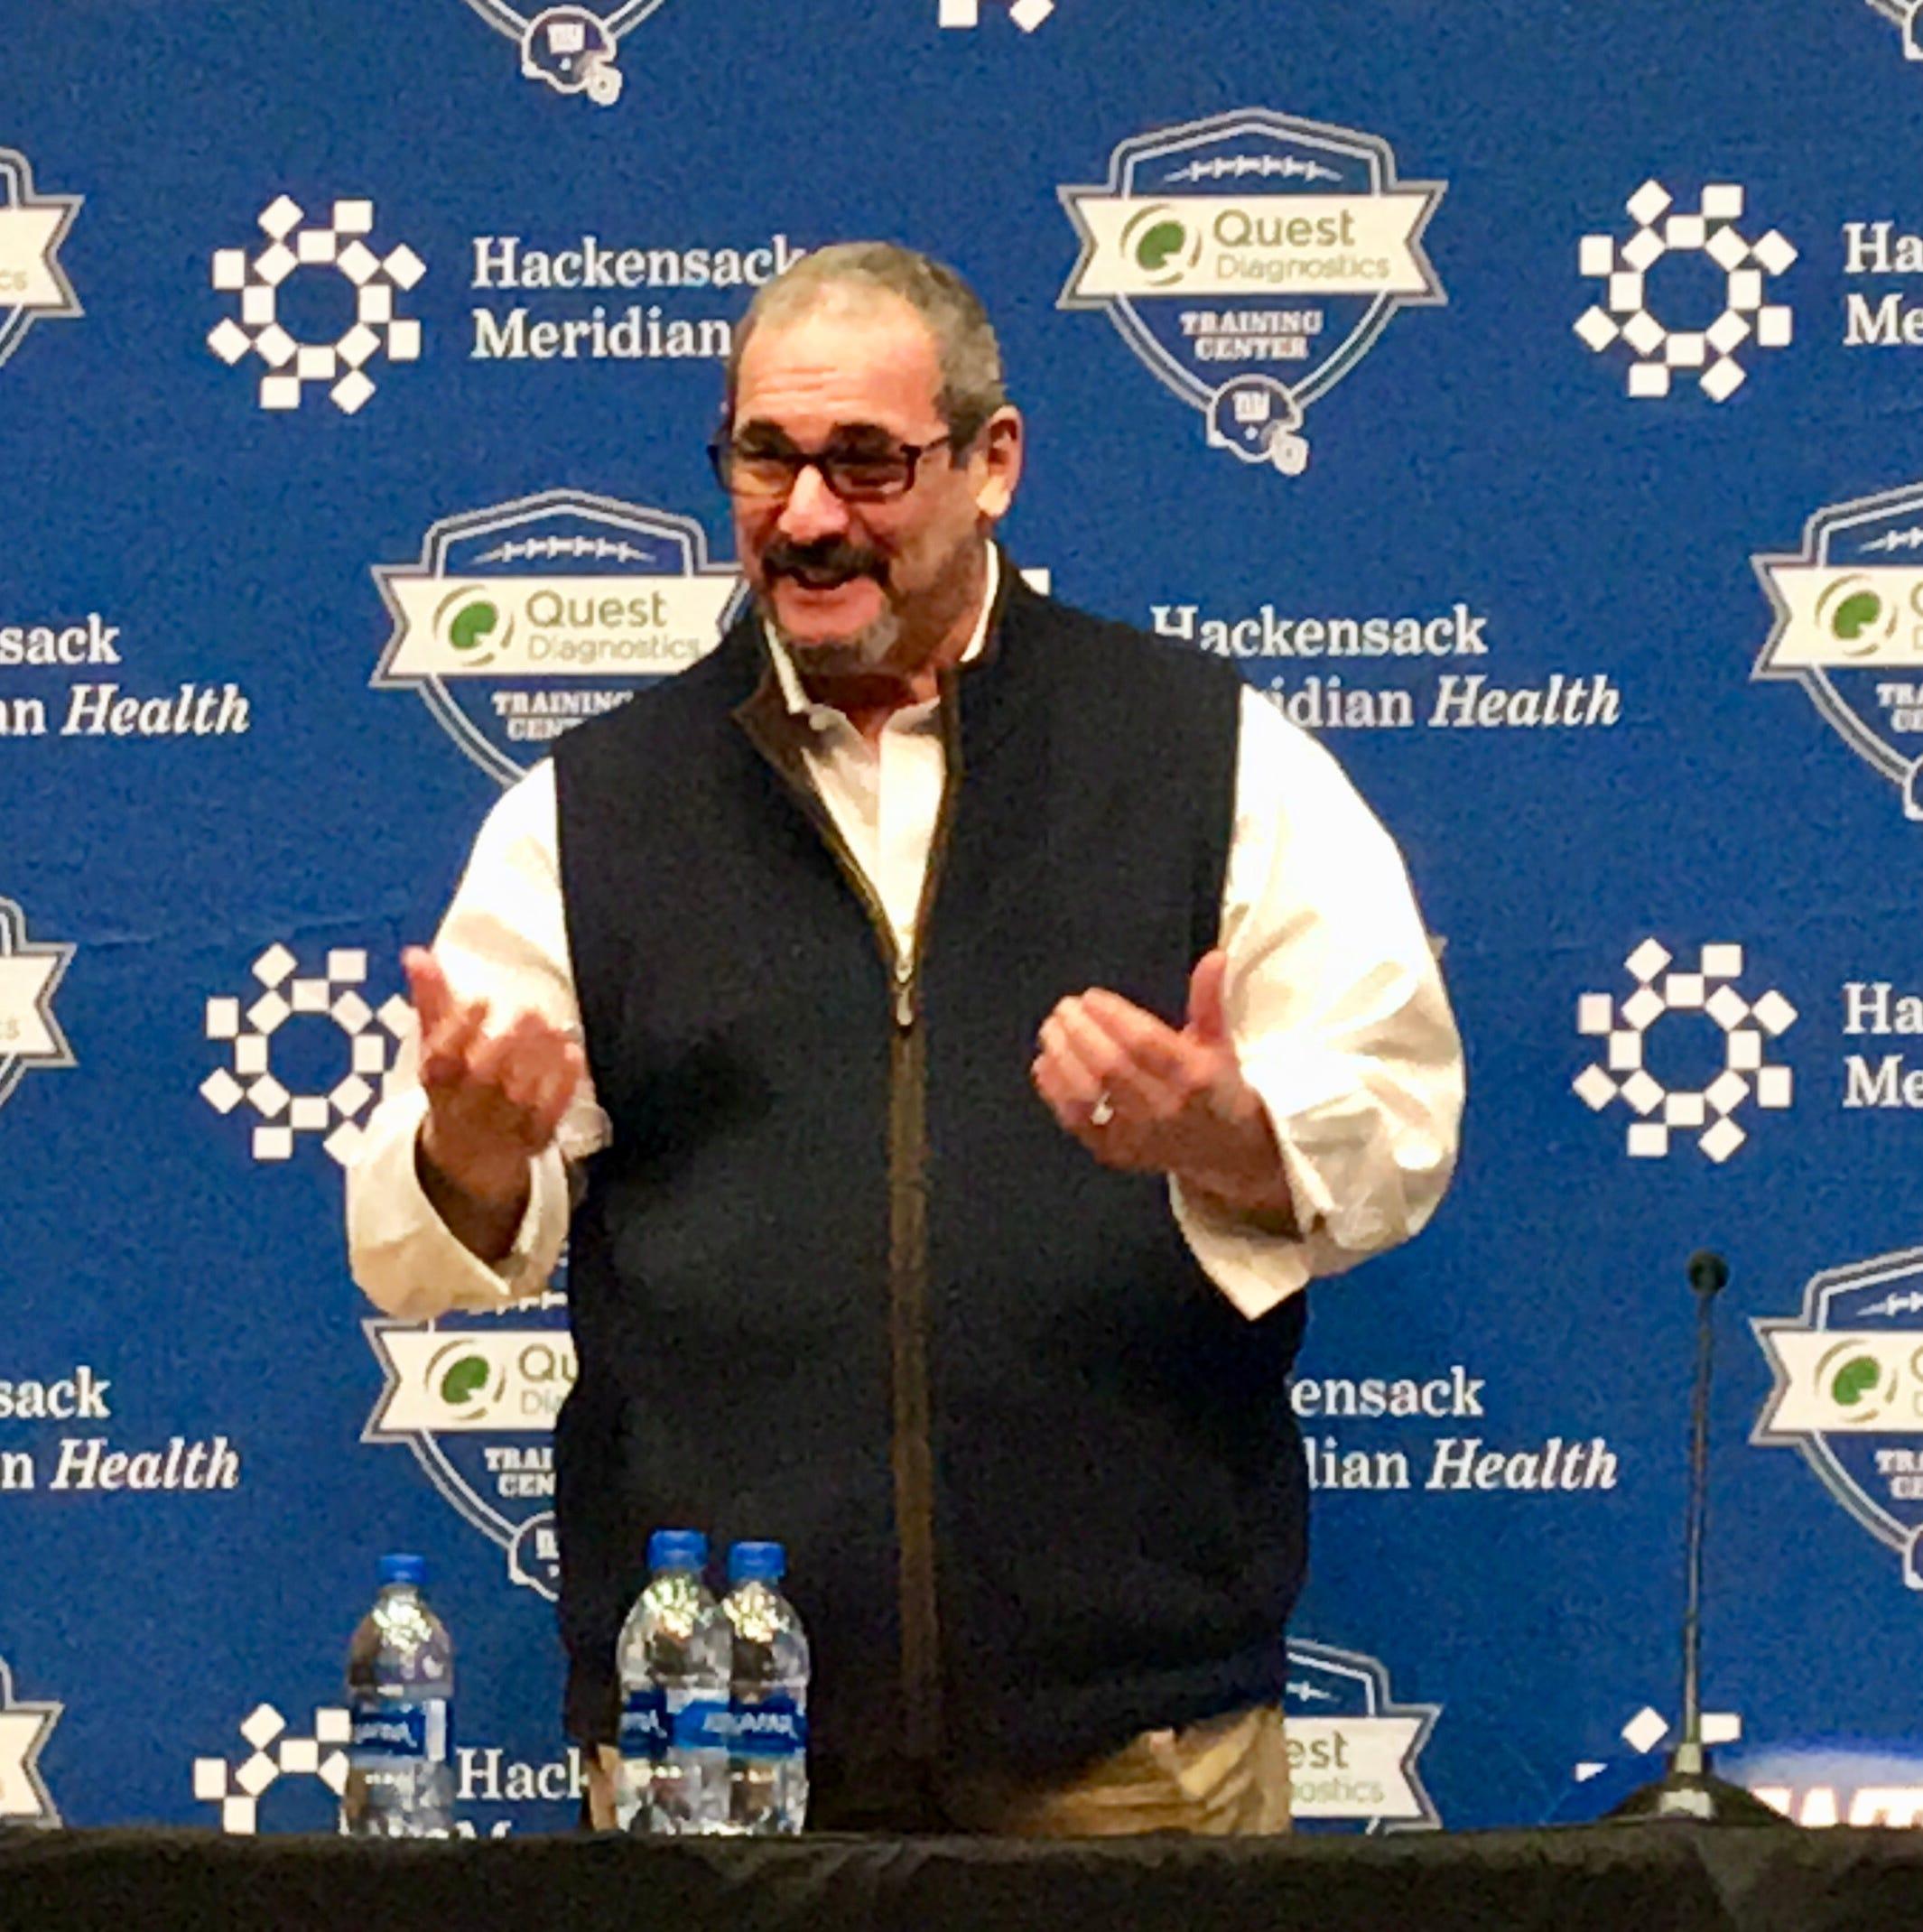 5 takeaways from NY Giants GM Dave Gettleman's season-ending address